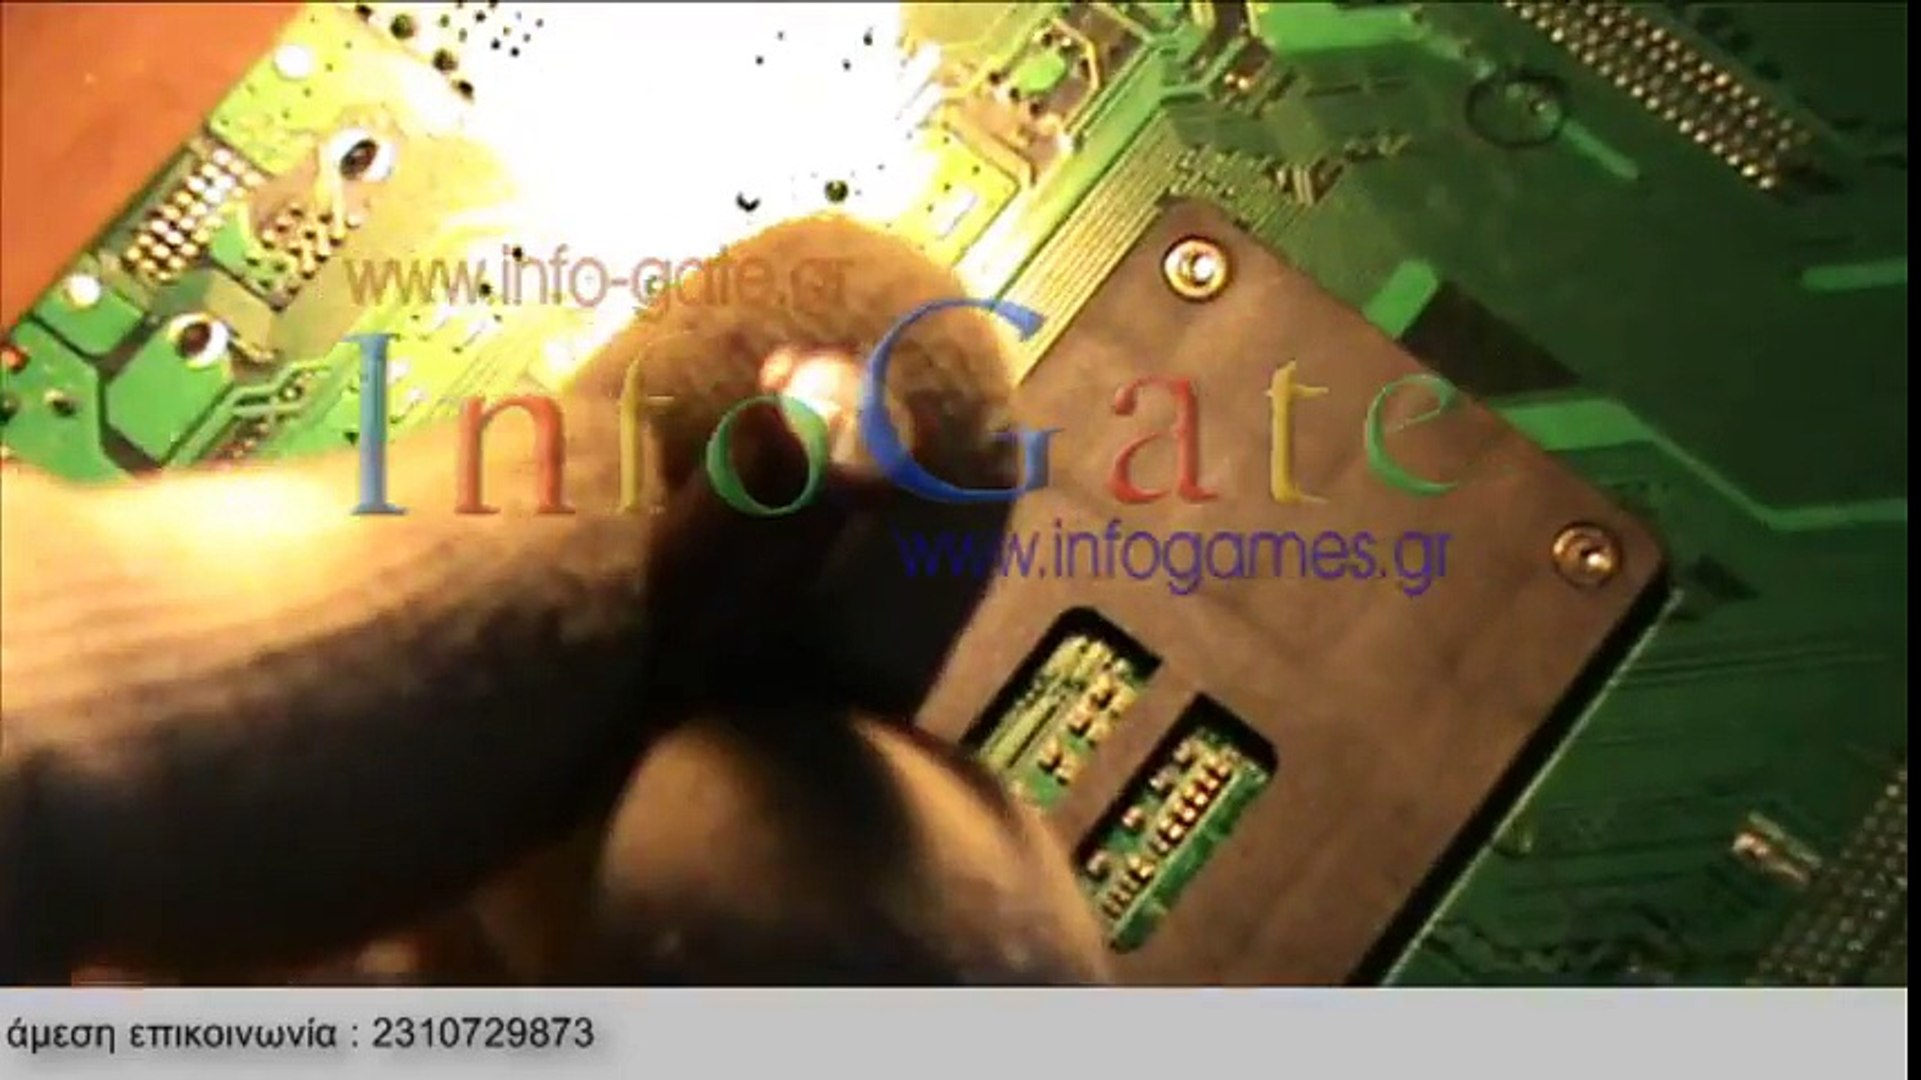 MCP61PM HM VIDEO TELECHARGER PILOTE